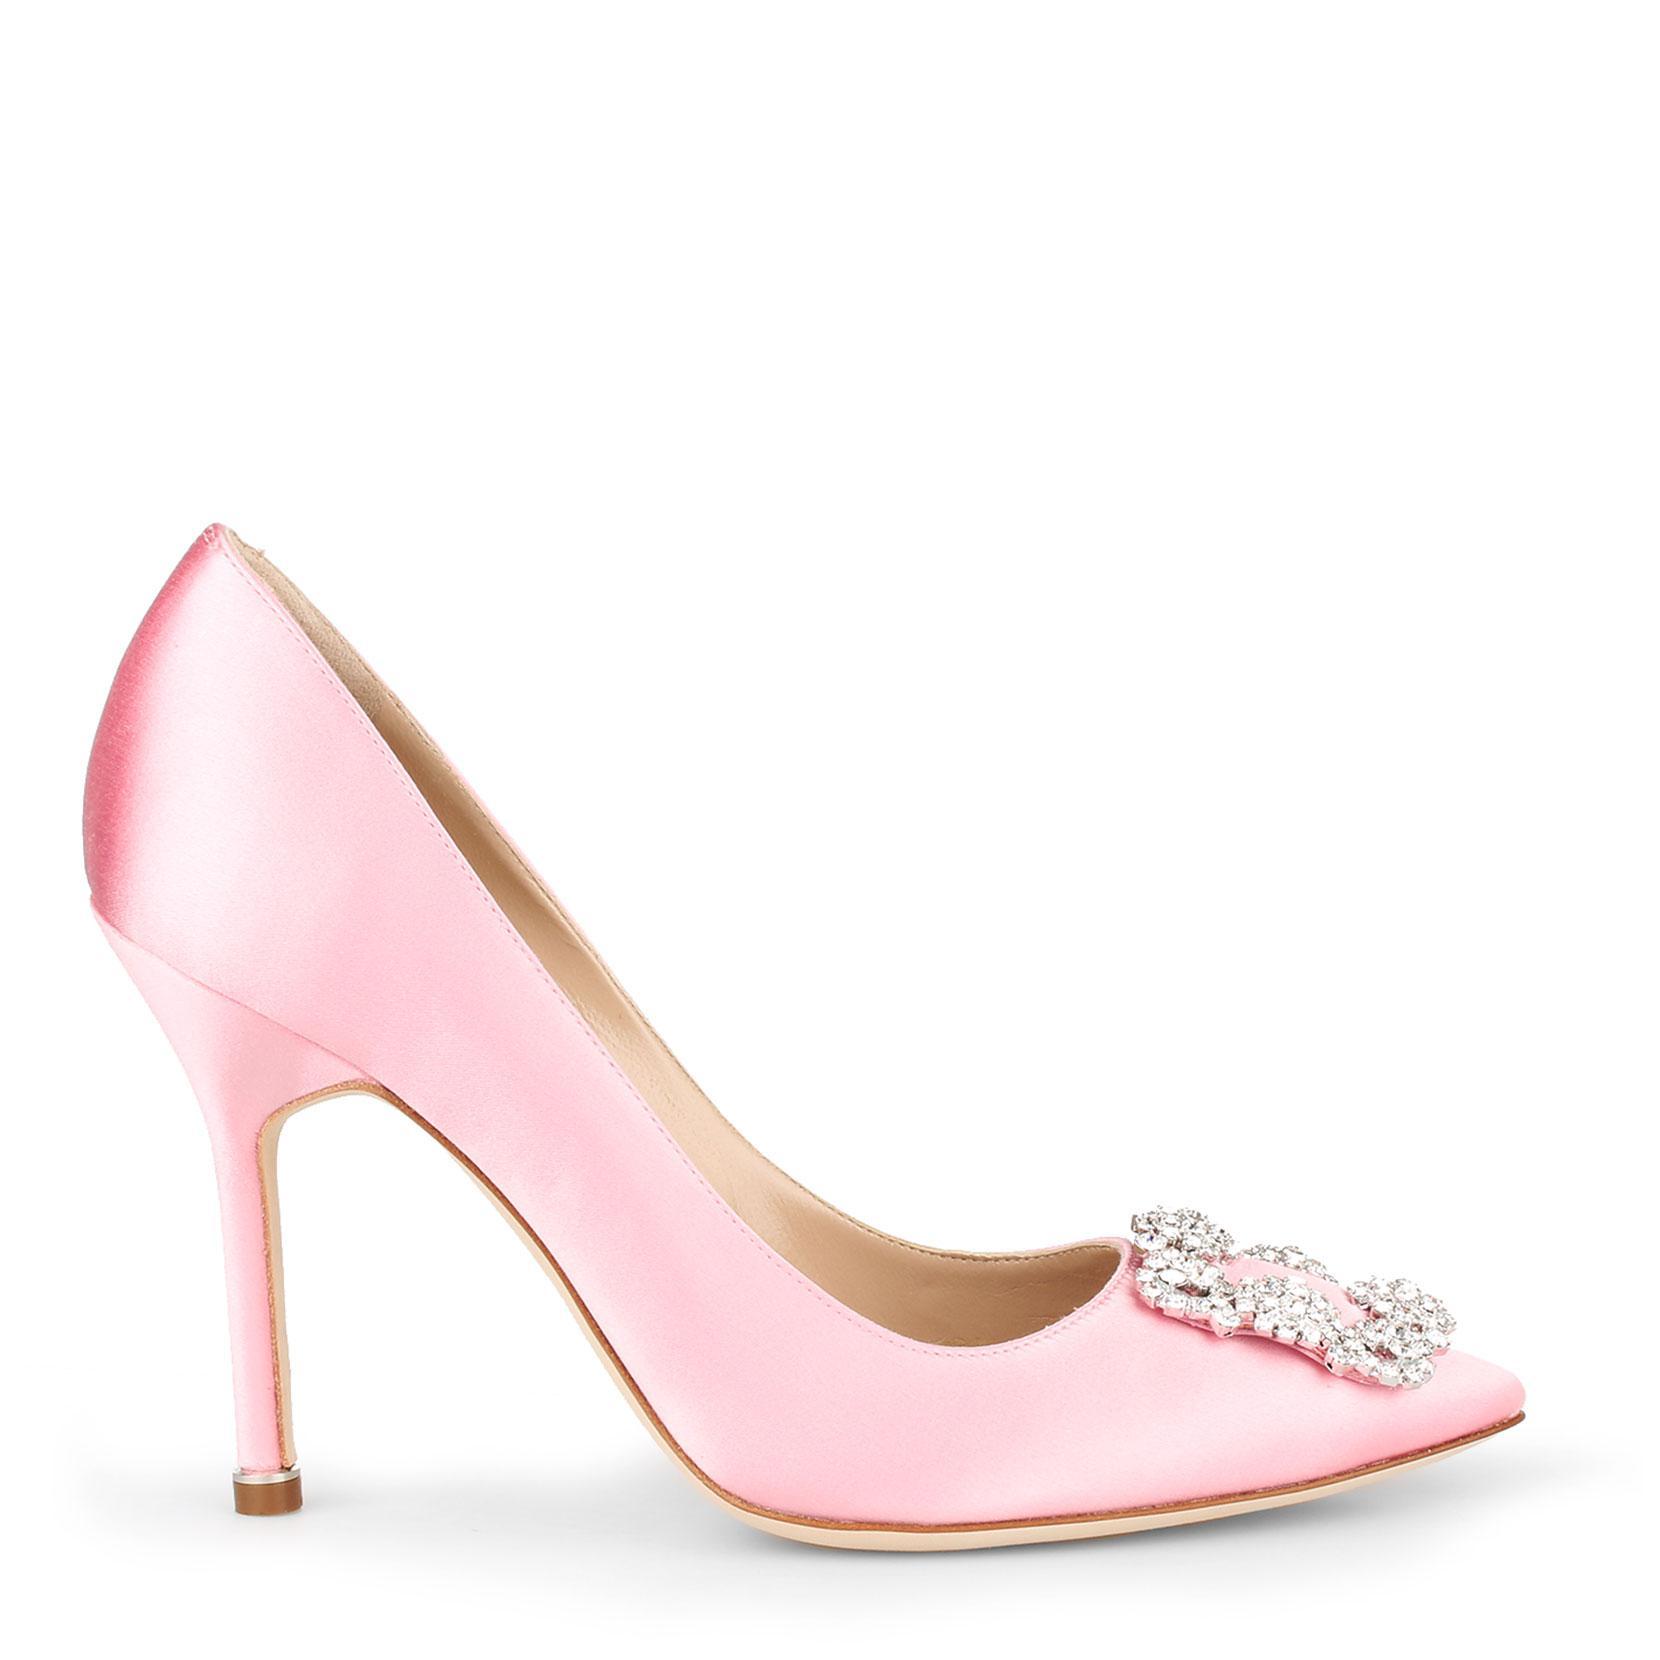 83d628a93bb1a ... Manolo Blahnik - Hangisi 105 Light Pink Satin Pump - Lyst.